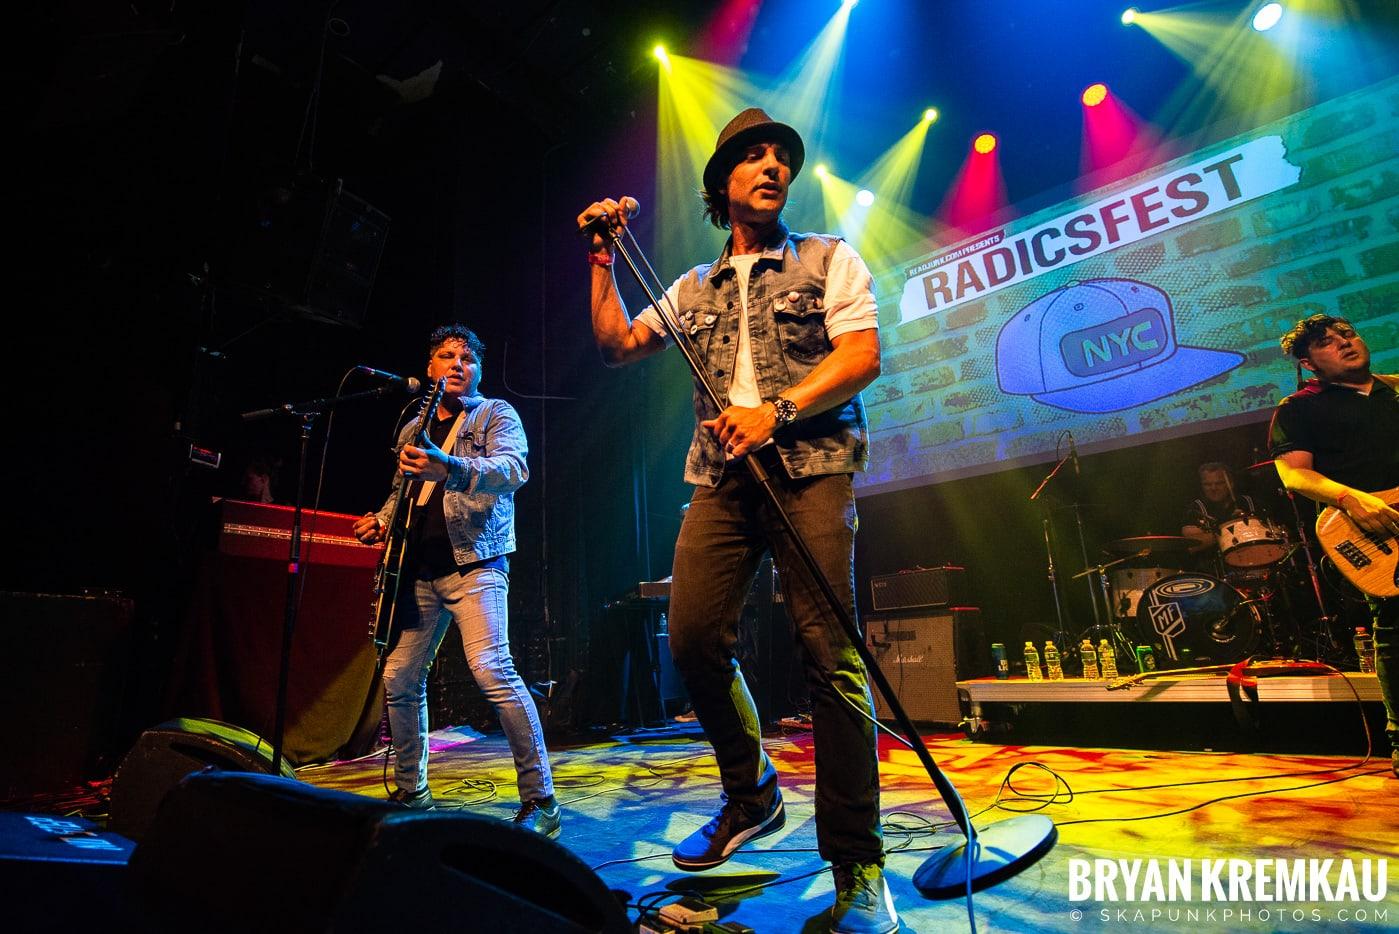 Spring Heeled Jack @ Radicsfest, Gramercy Theatre, NYC - 7.19.19 (31)